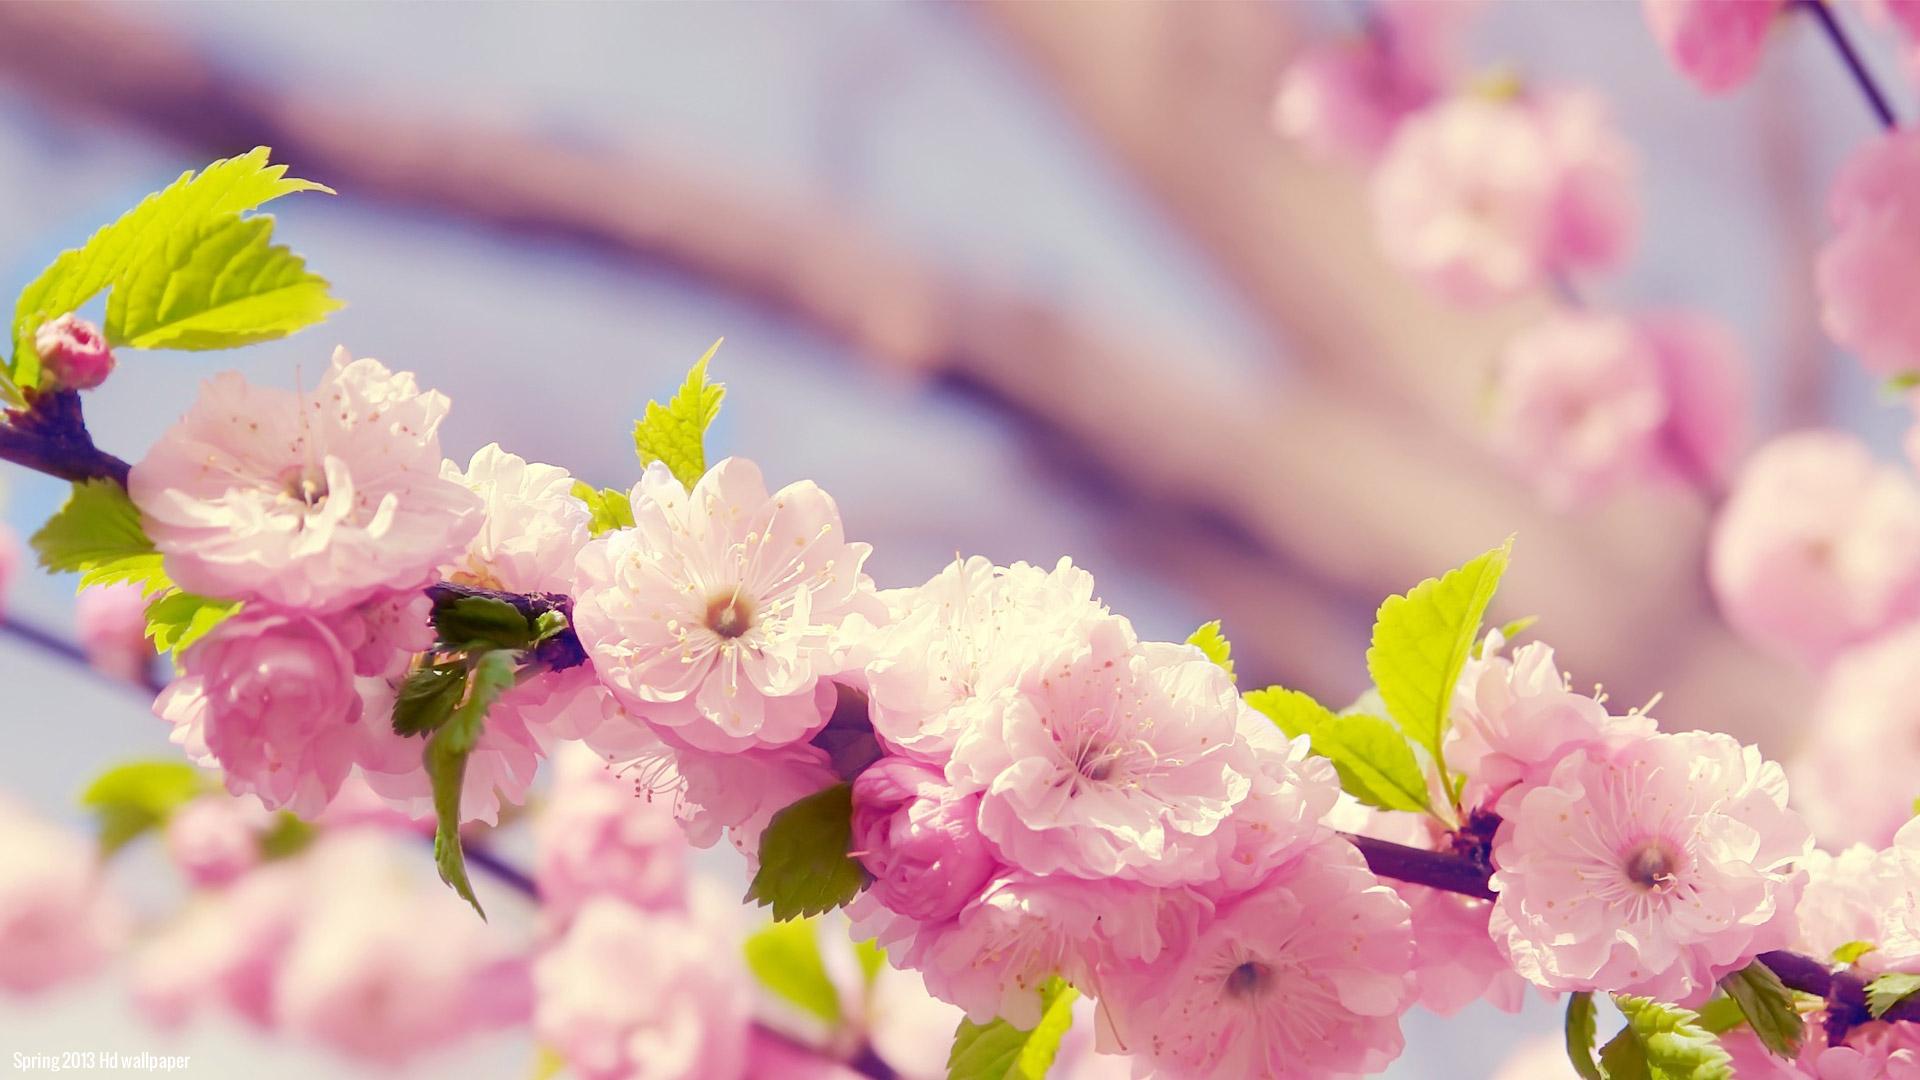 Flowers Full HD Wallpapers download 1080p desktop backgrounds 1920x1080